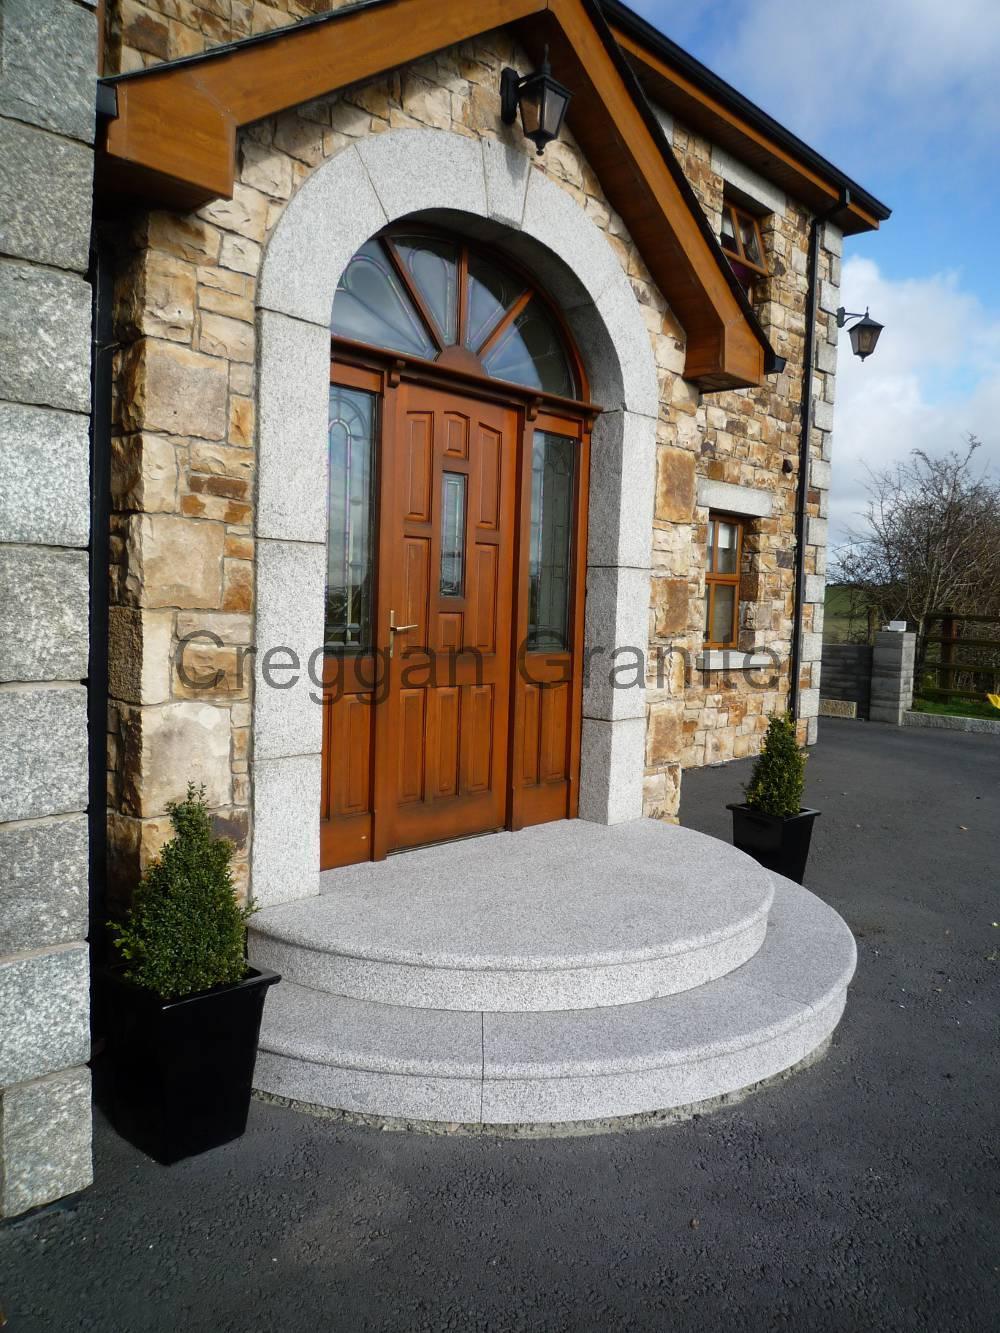 Door Surrounds Arches Creggan Granite Ireland Make Your Own Beautiful  HD Wallpapers, Images Over 1000+ [ralydesign.ml]